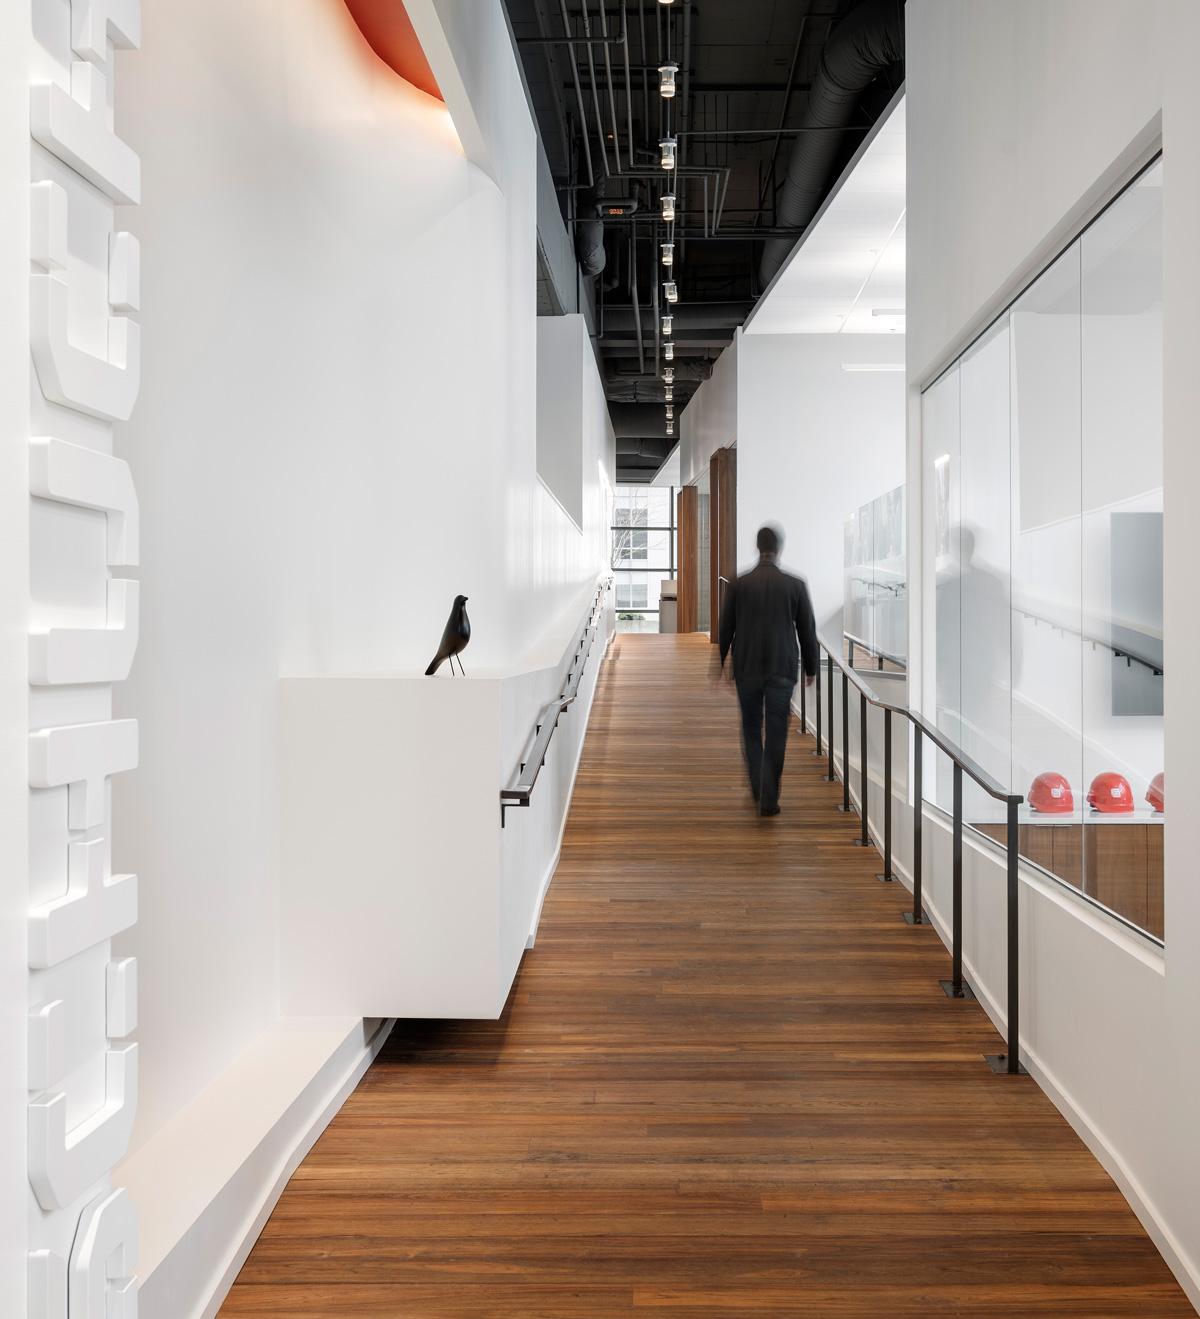 Schuchart office Seattle office hallway entry ramp, reclaimed wood